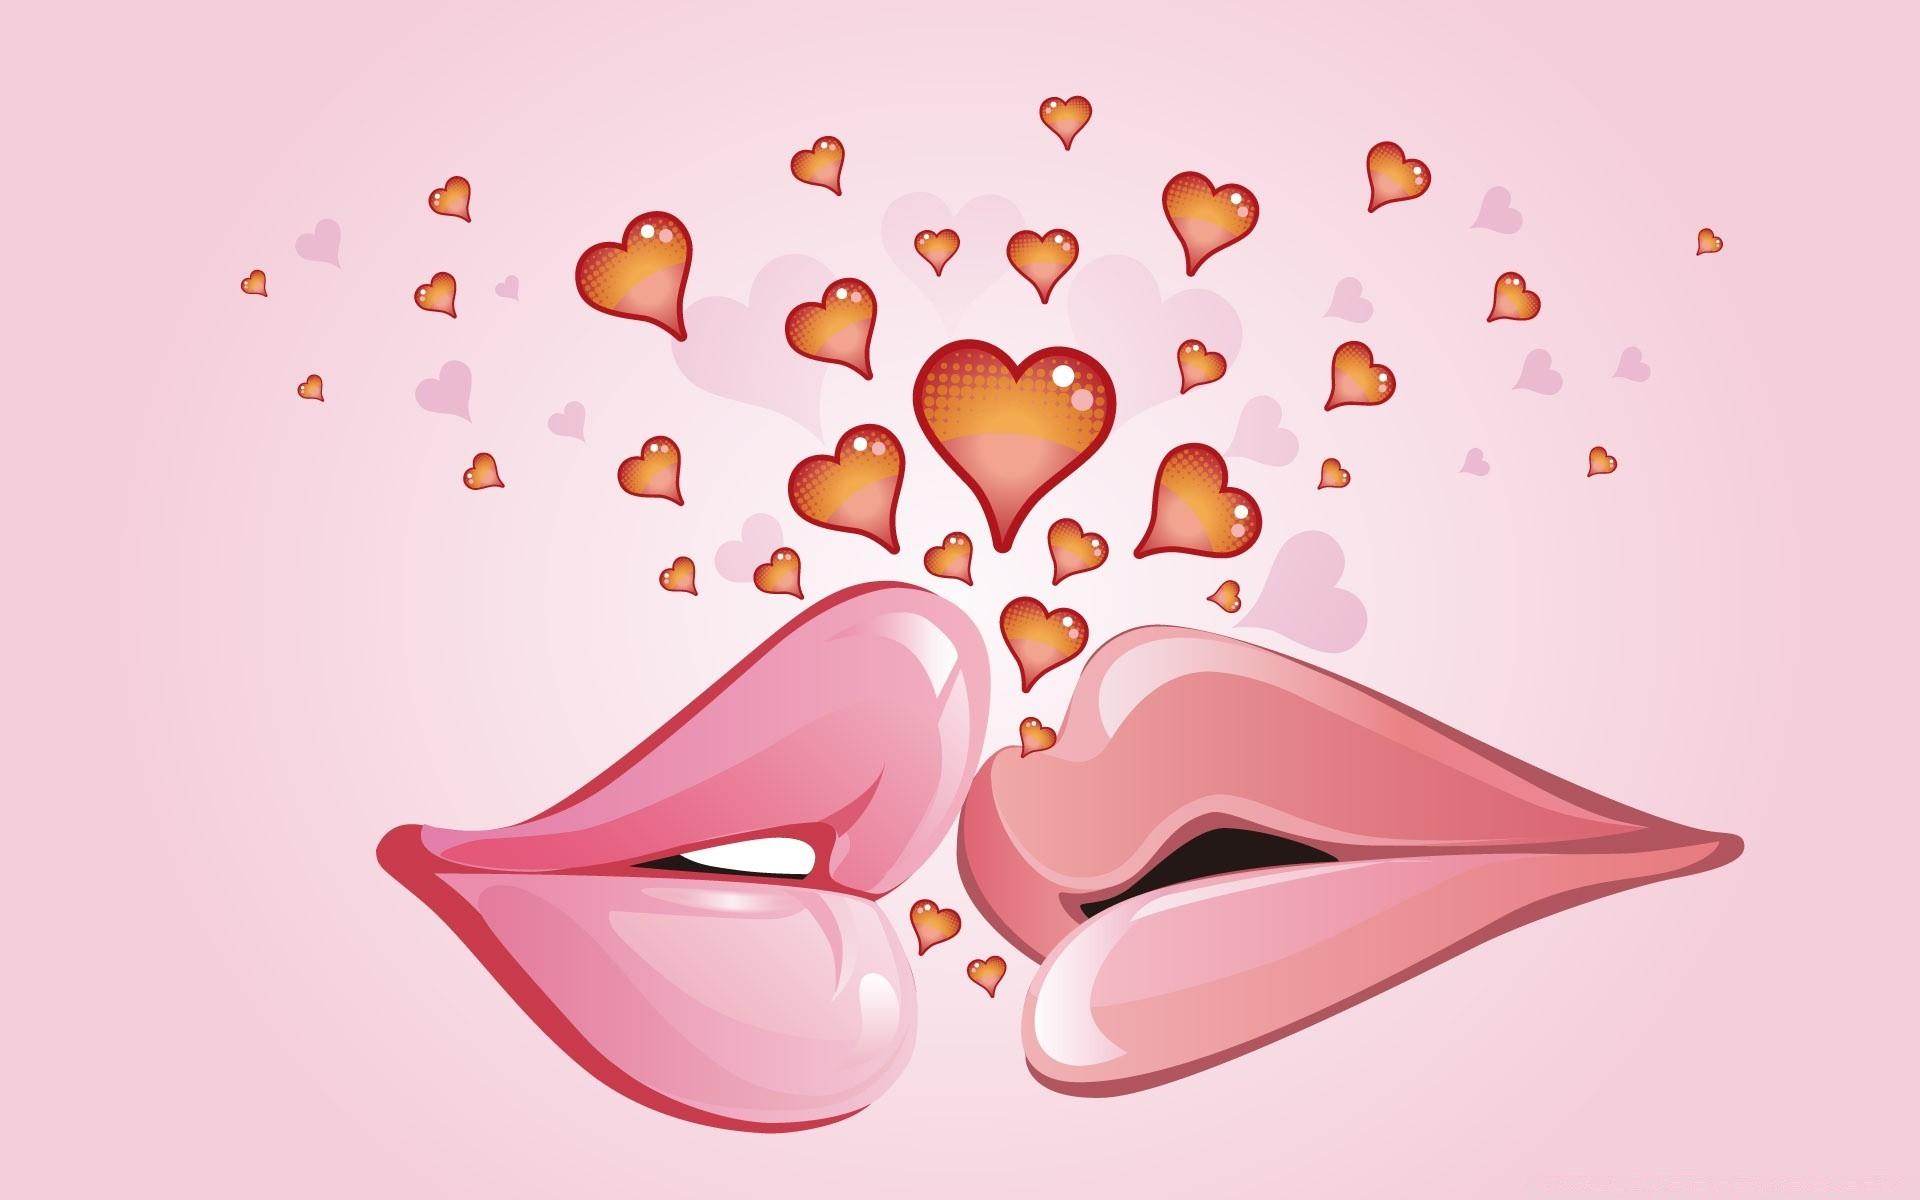 Мартом коллегам, открытки на телефон поцелуй